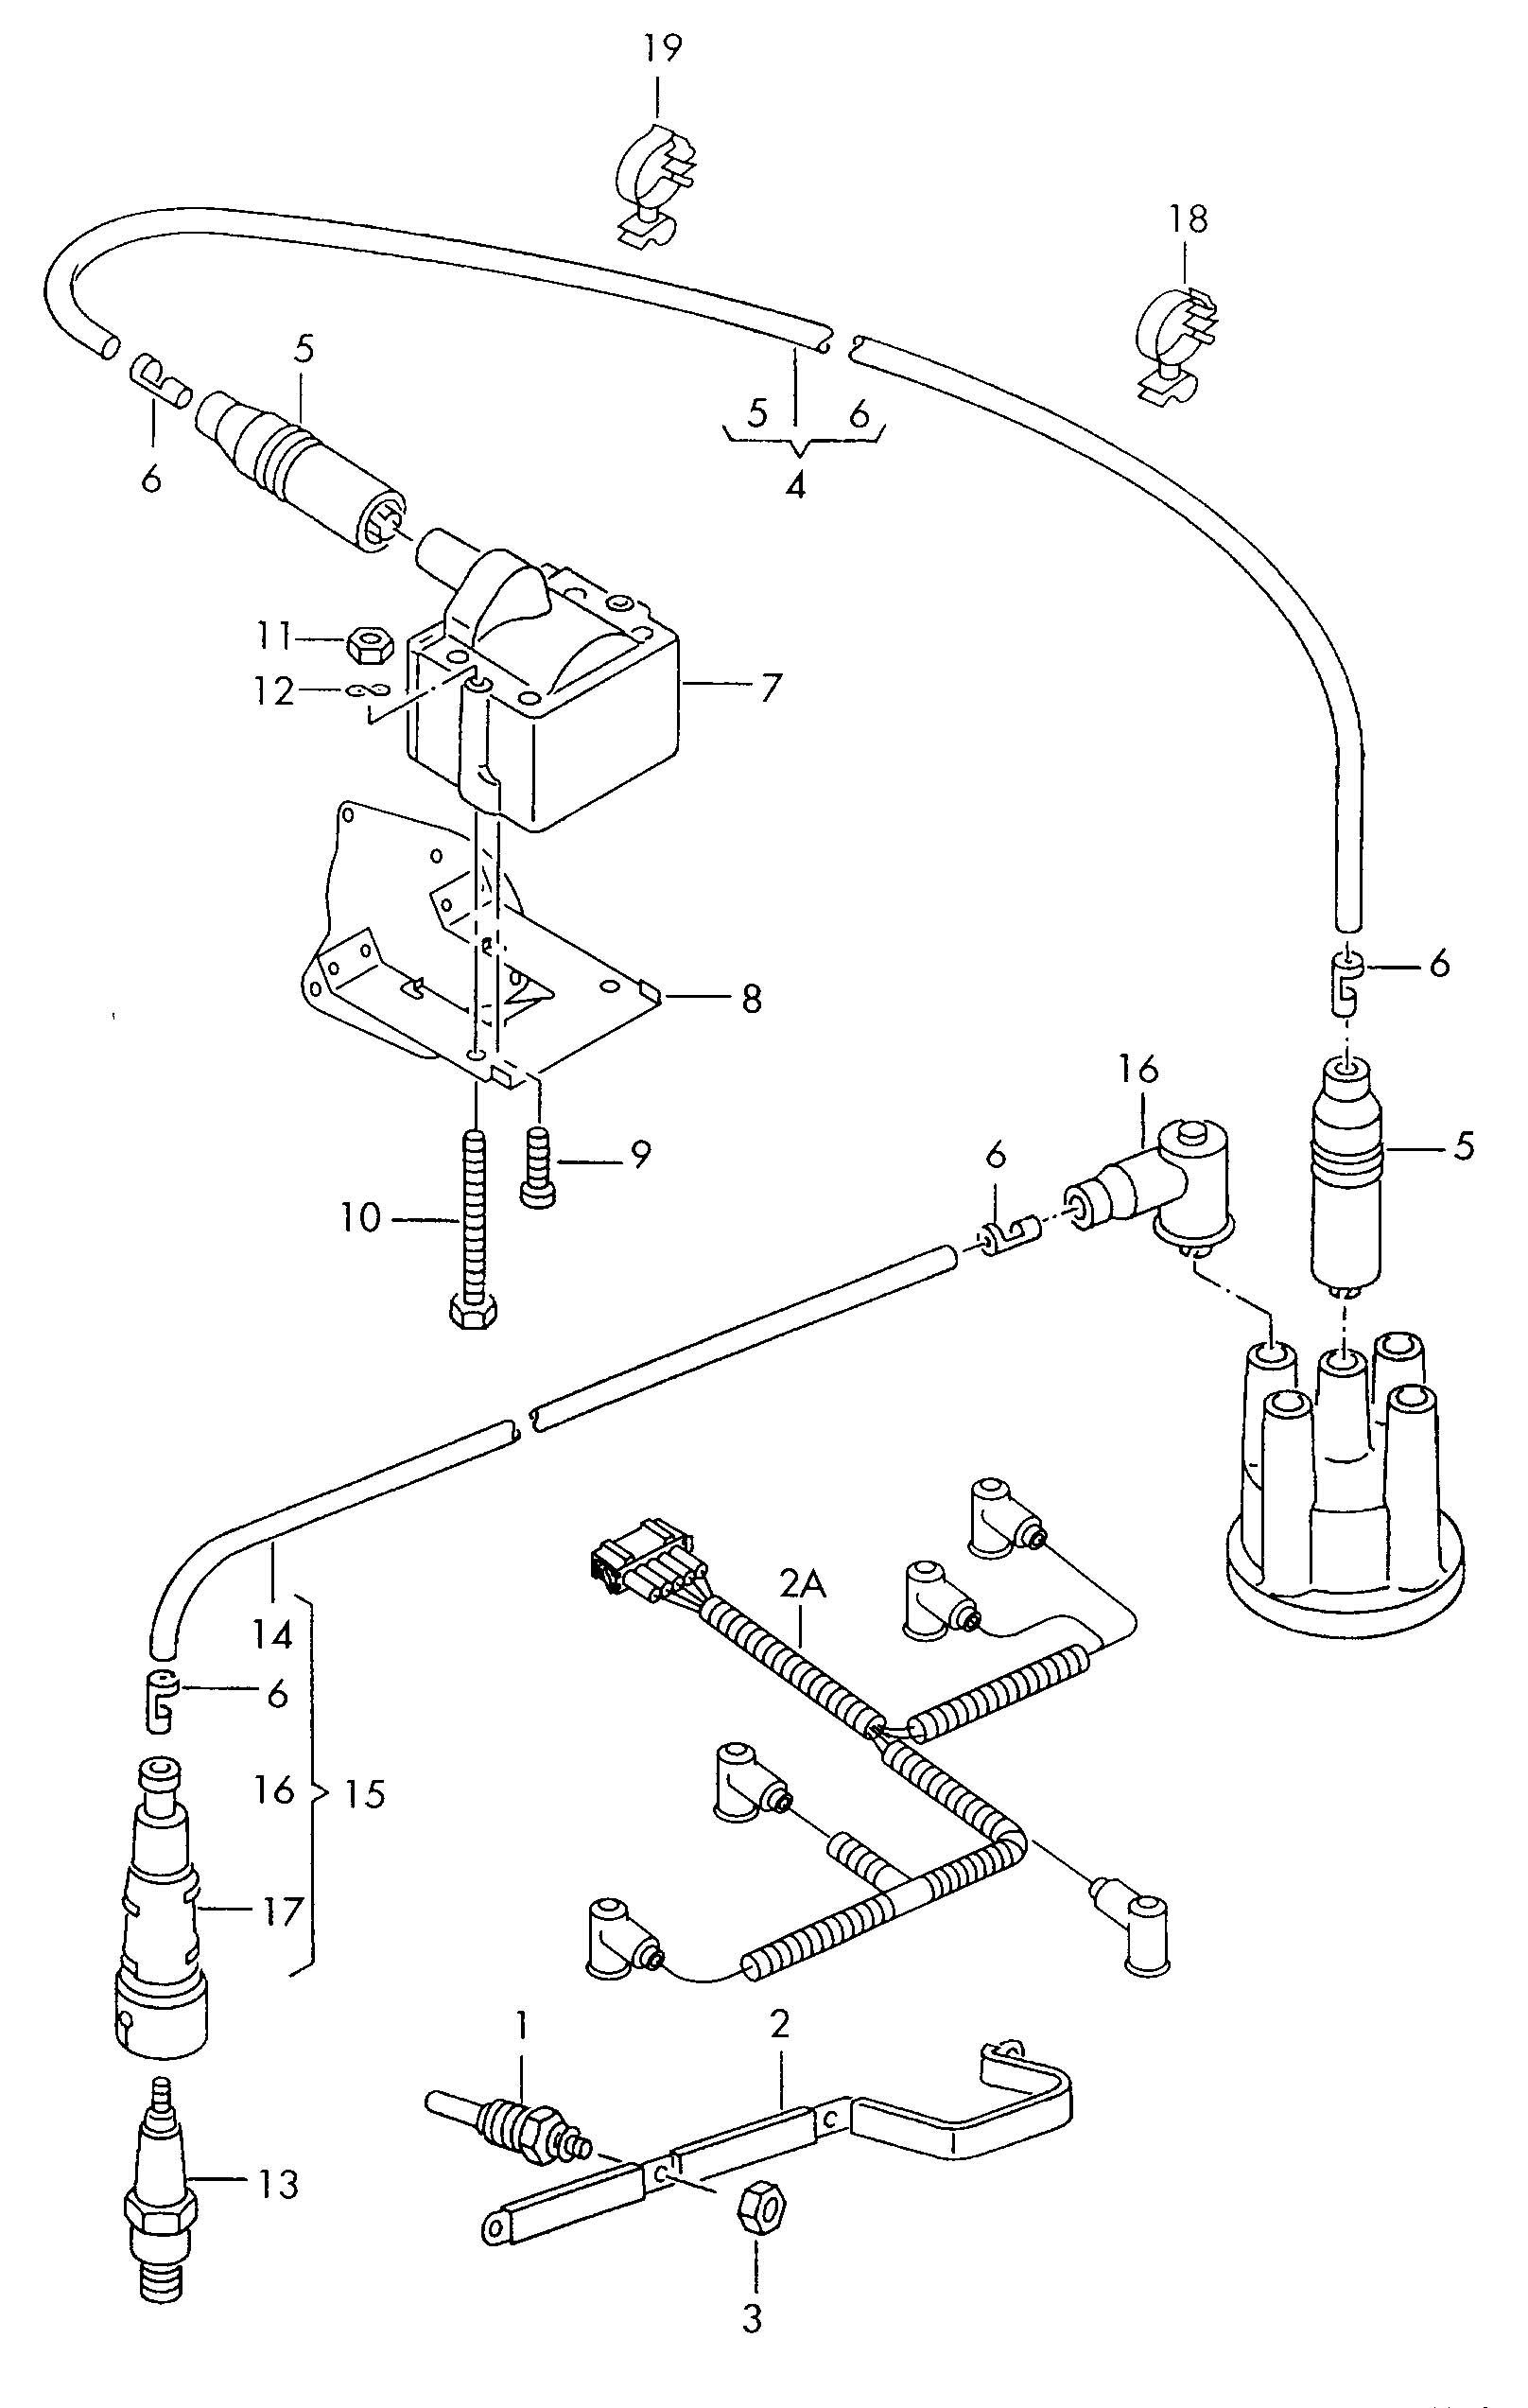 2000 Ford ranger 3.0 spark plug wiring diagram